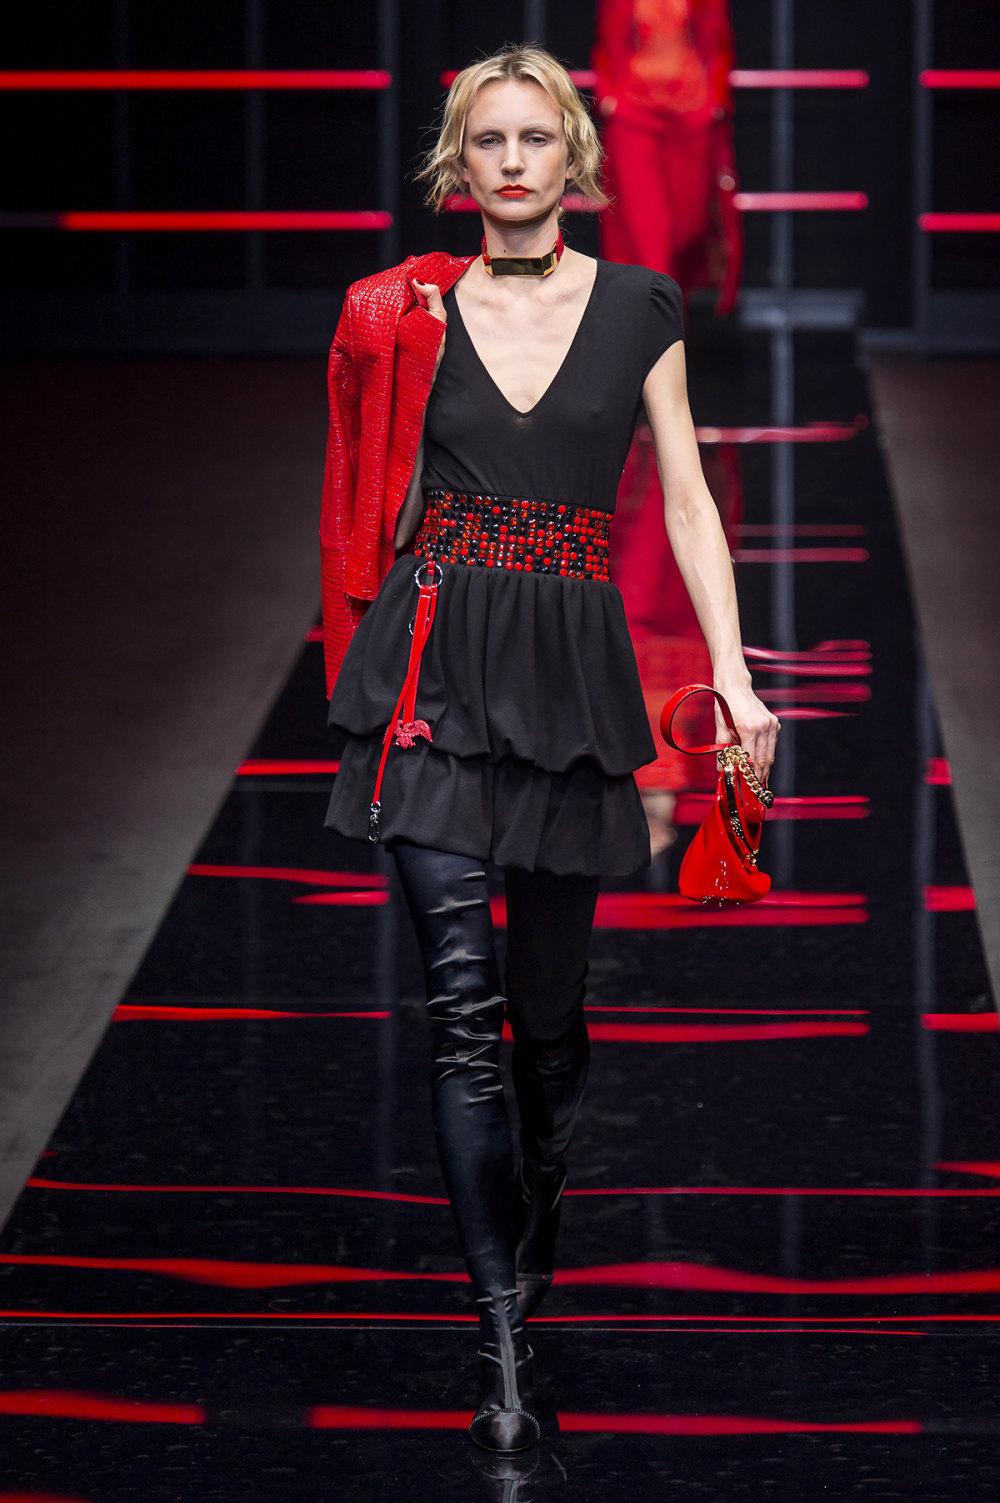 Emporio Armani时装系列畅的裤子带有柔滑裙子的鸡尾酒礼服-52.jpg